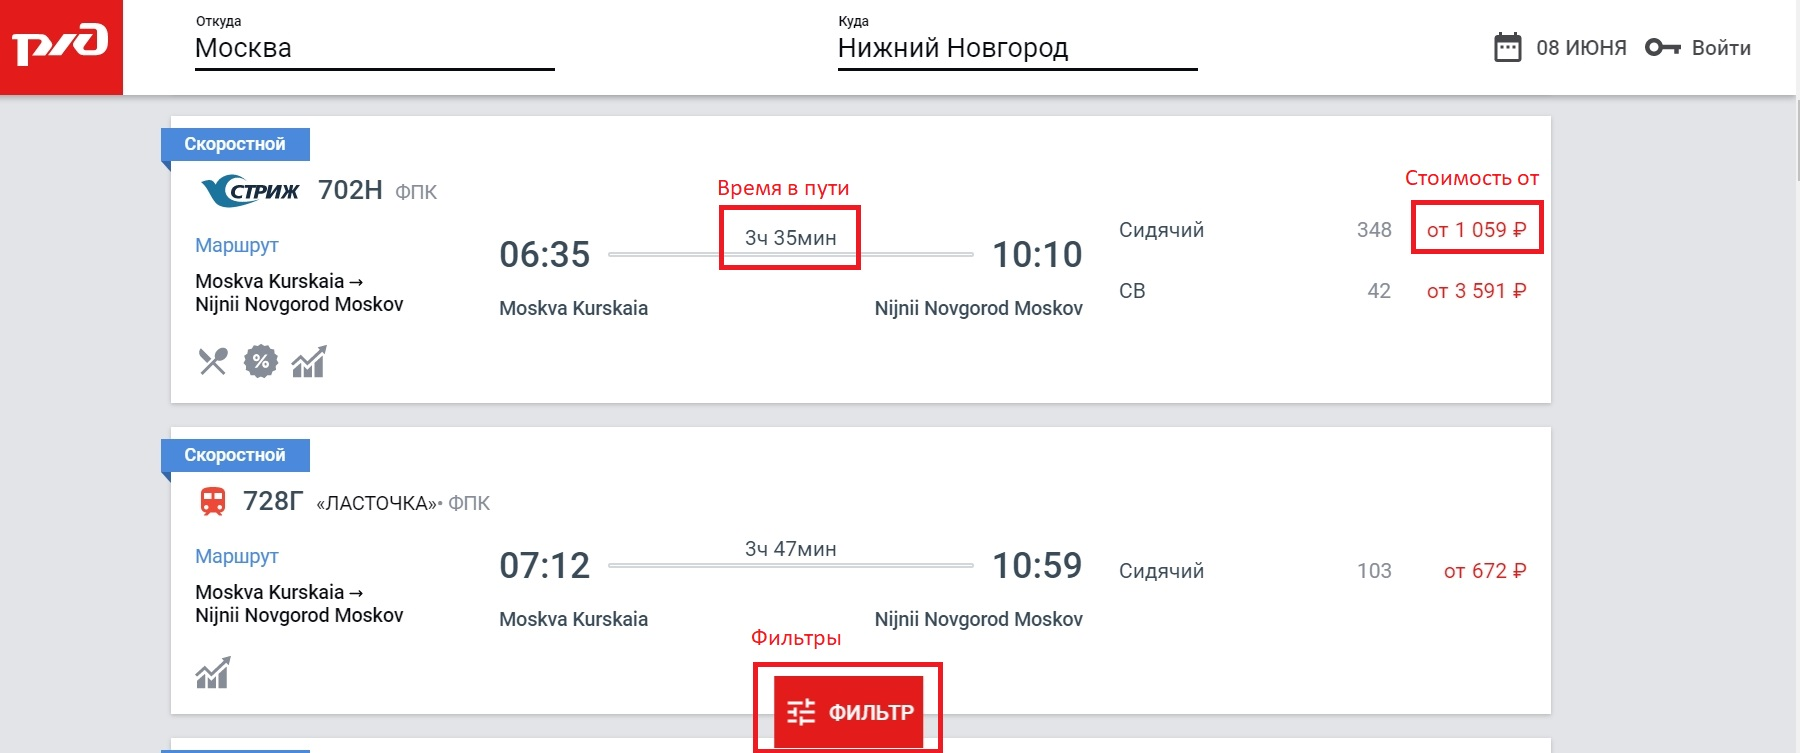 Инструкция по покупке билета РЖД онлайн